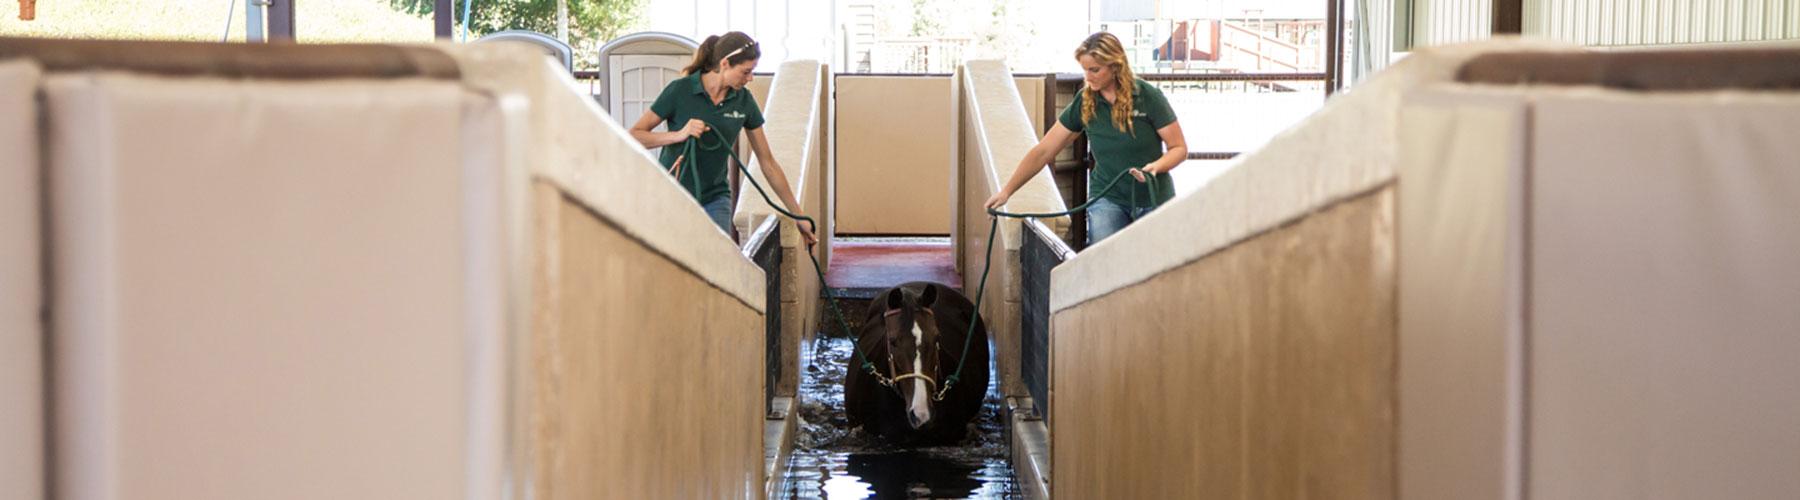 Platinum advisor with her horse